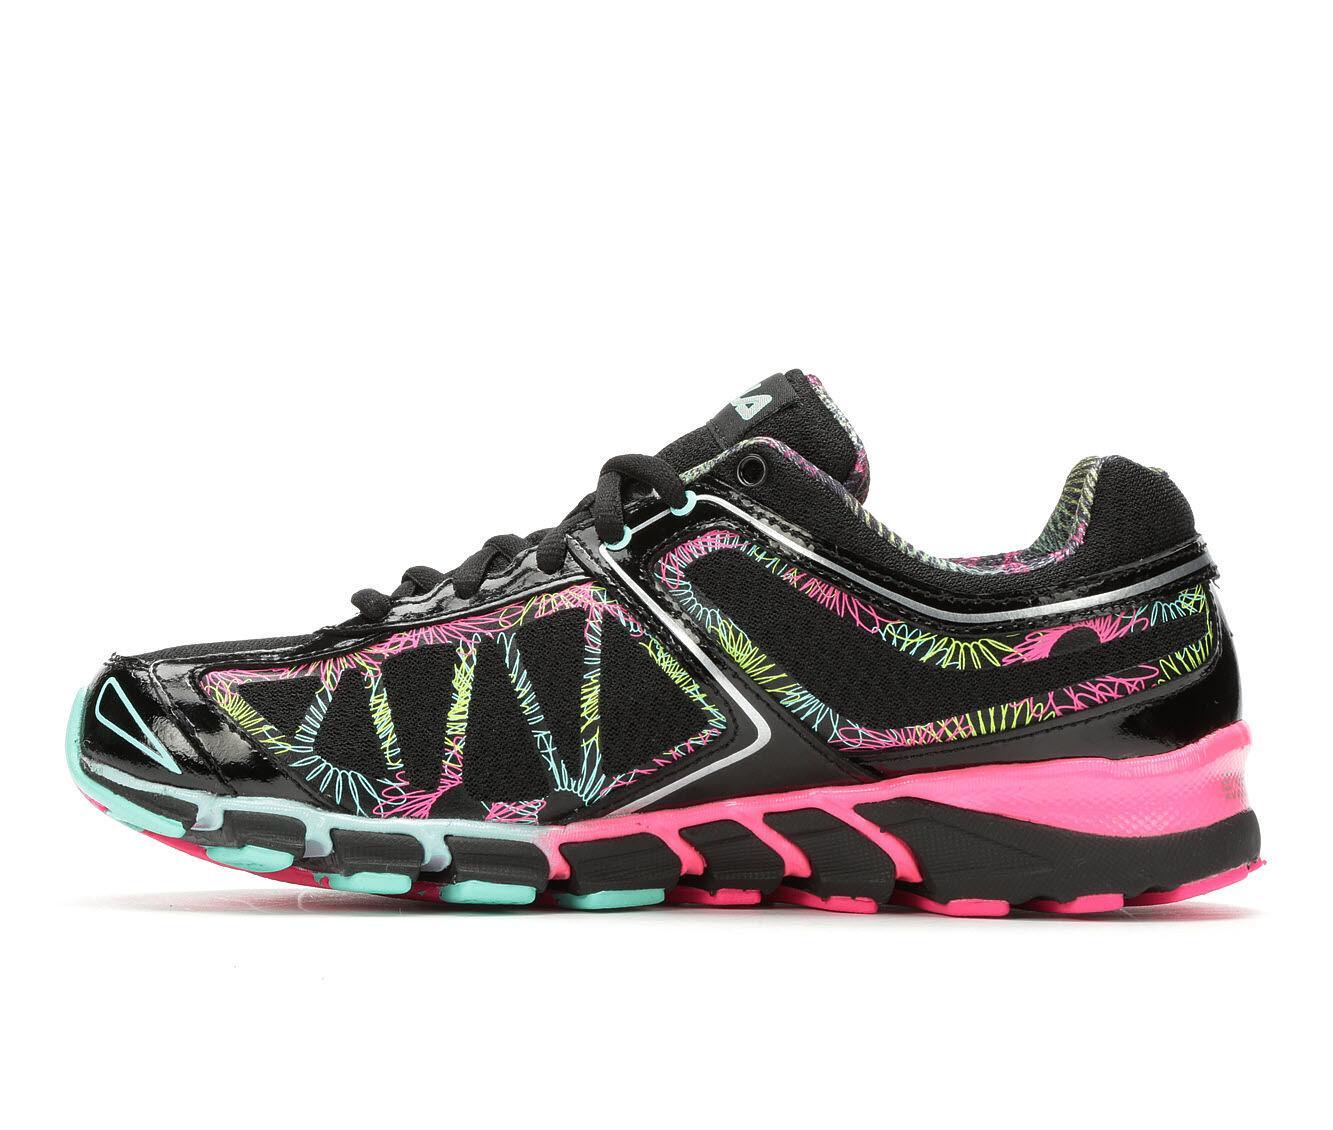 Fila Synthetic Sprint Evo Athletic Shoe